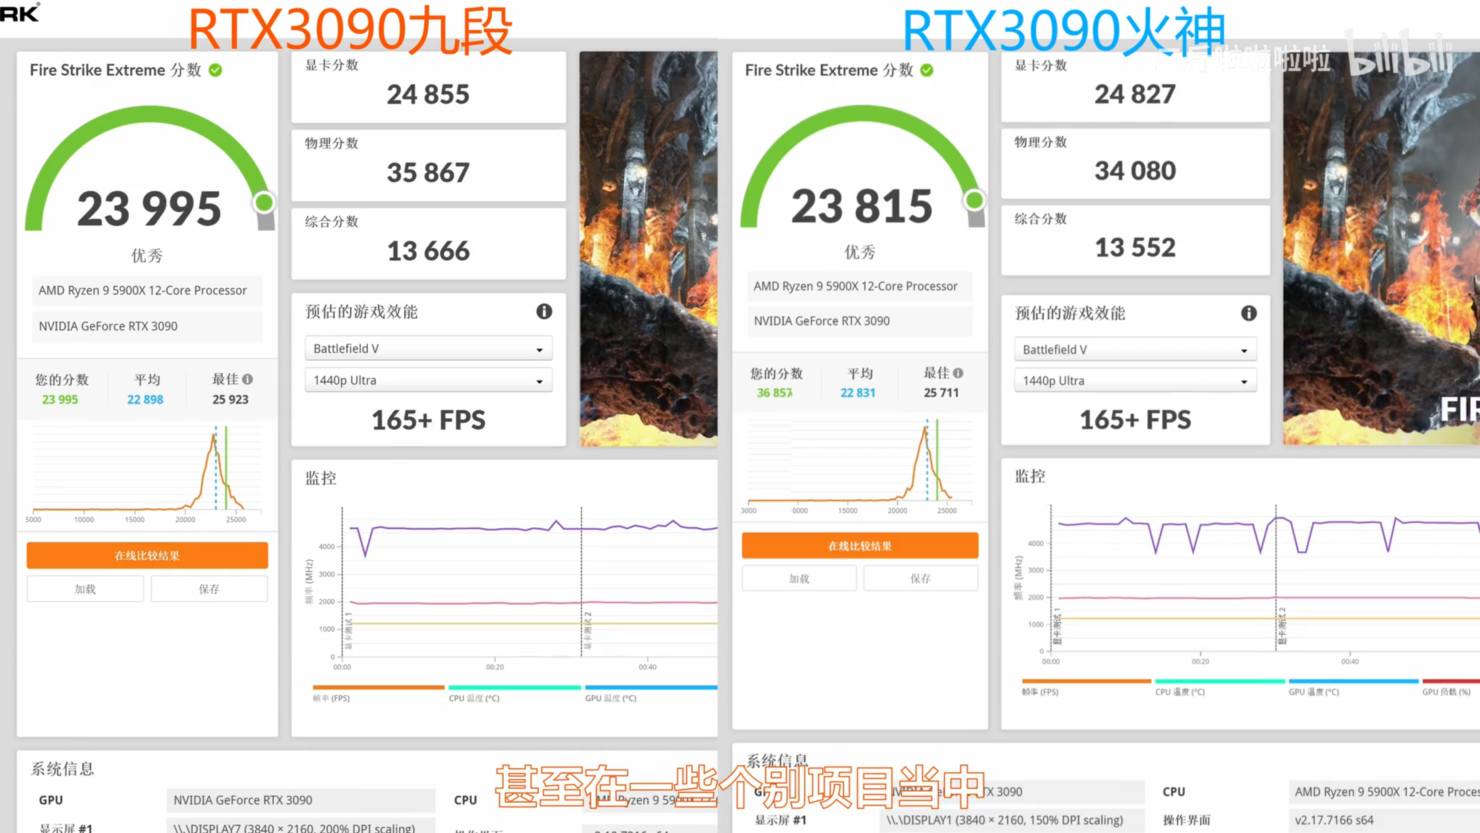 colorful-igame-geforce-rtx-3090-kudan-graphics-card-benchmarks-_3